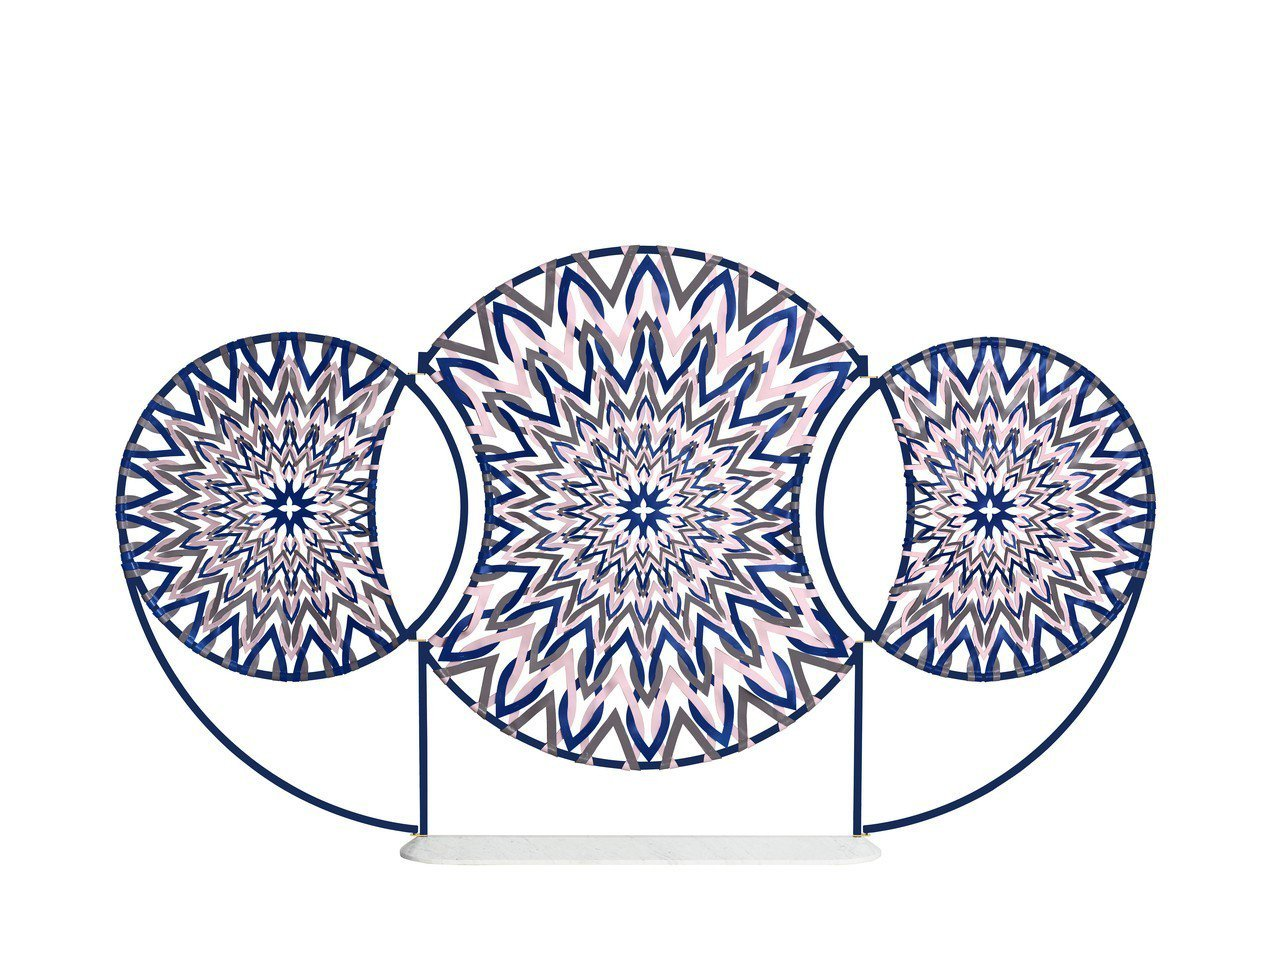 以路易威登Monogram壓紋為靈感,Zanellato/Bortotto設計的...